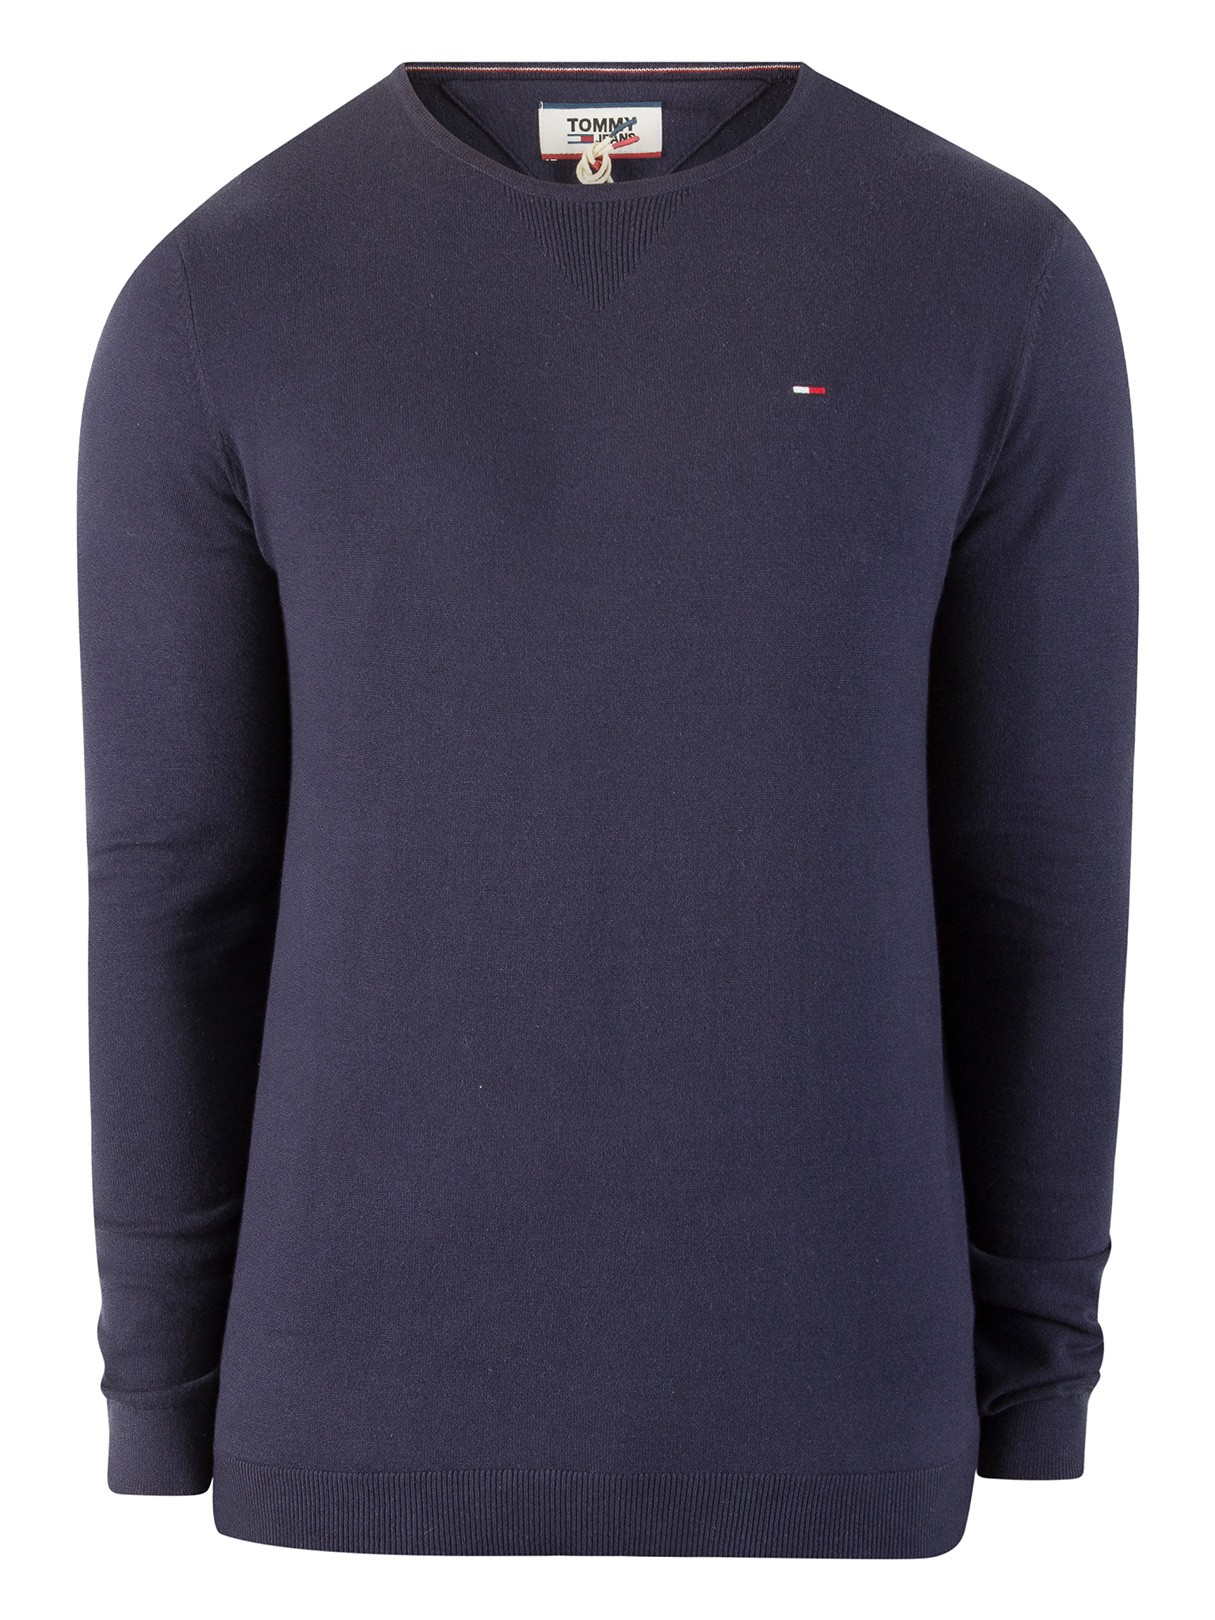 79a09f6666df3 Tommy Jeans Black Iris Original Knit